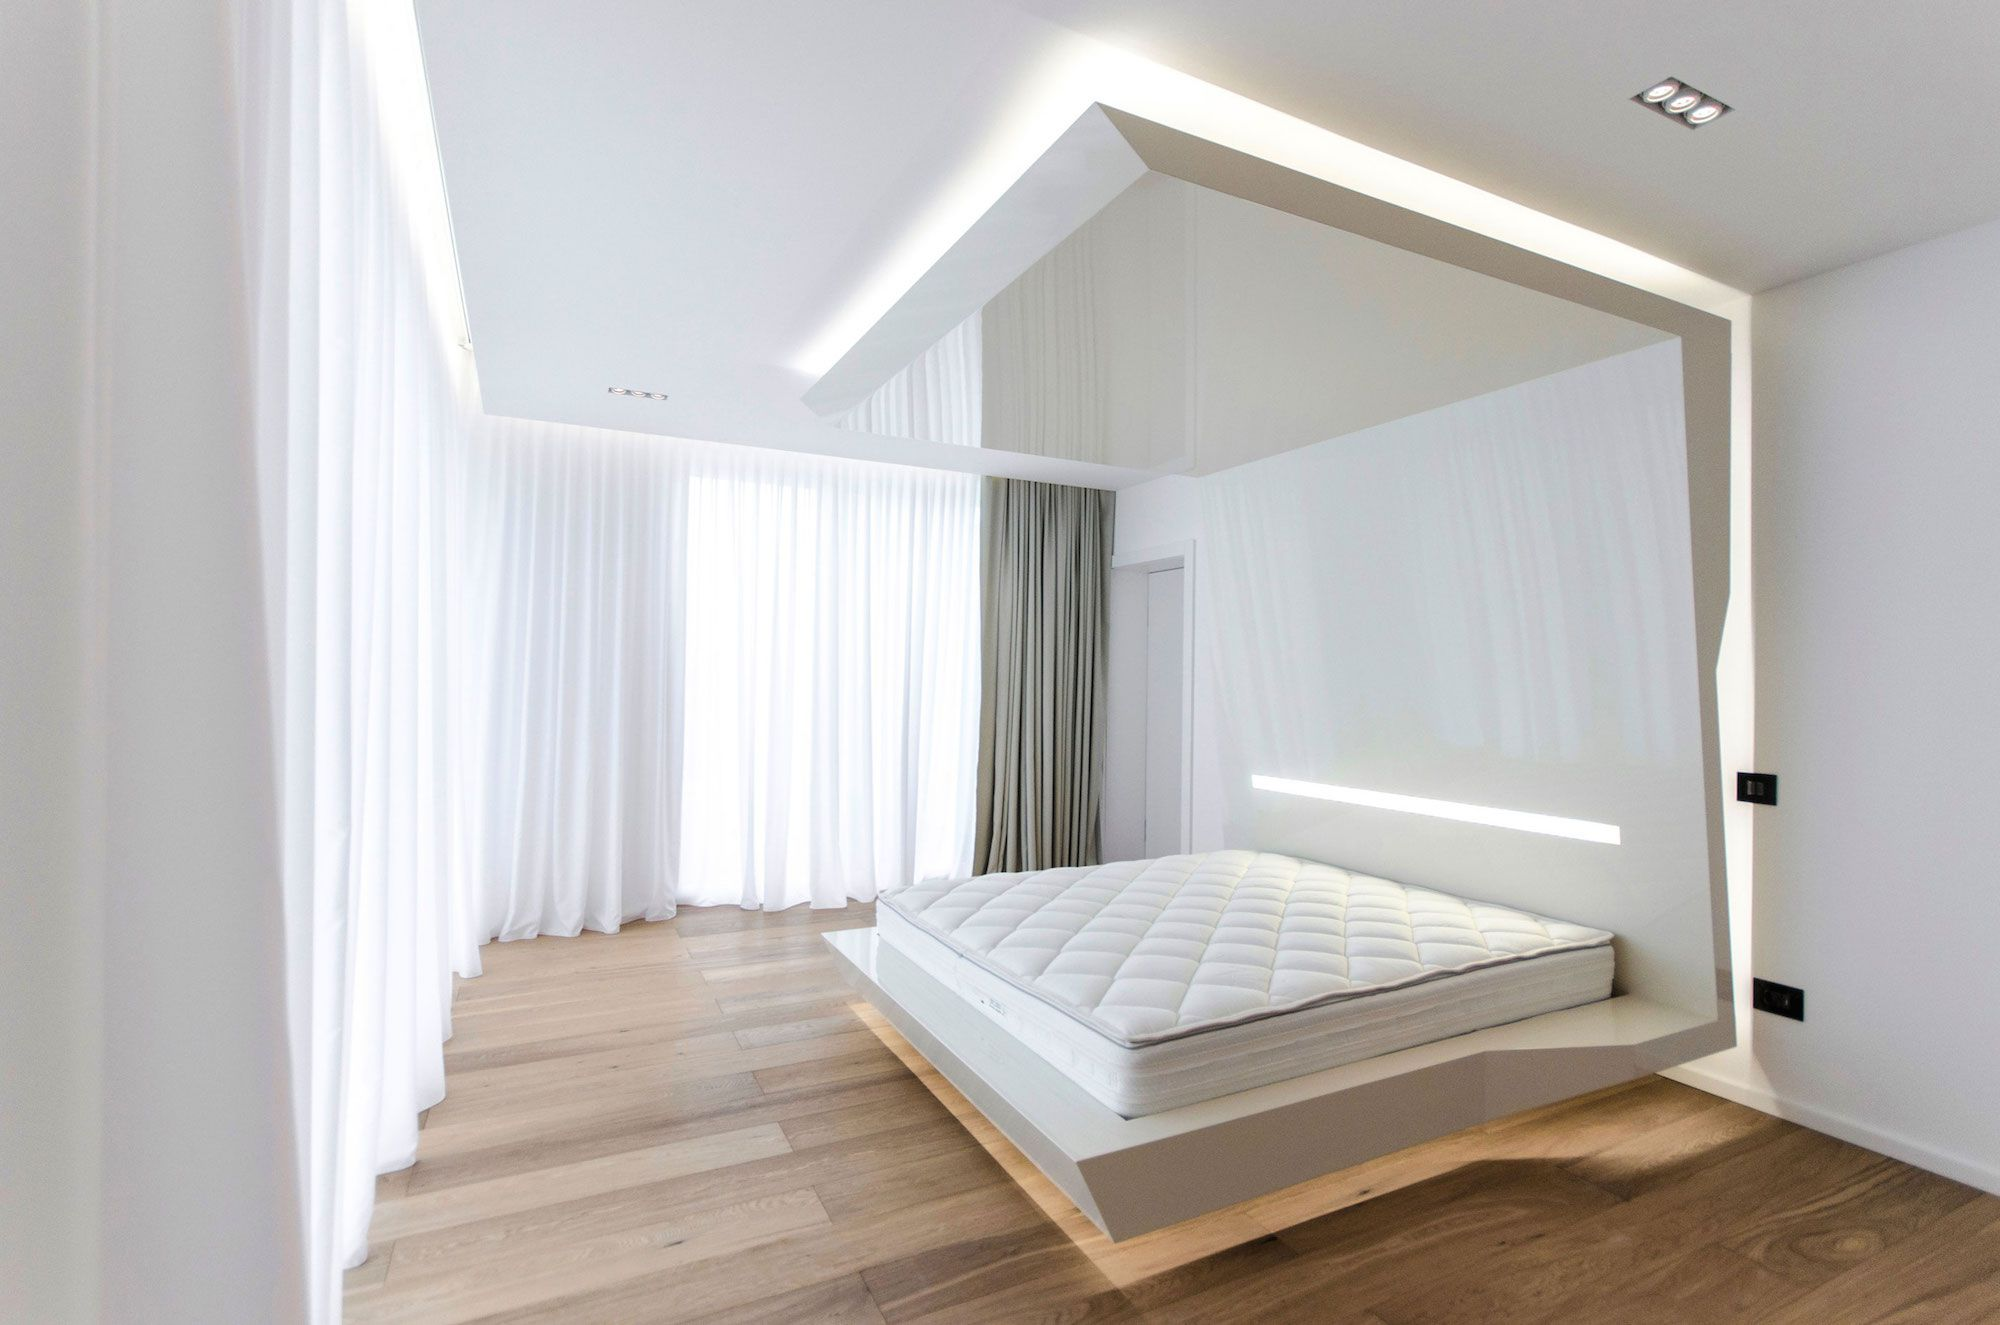 Ultramodern-C-House-in-Timisoara-11